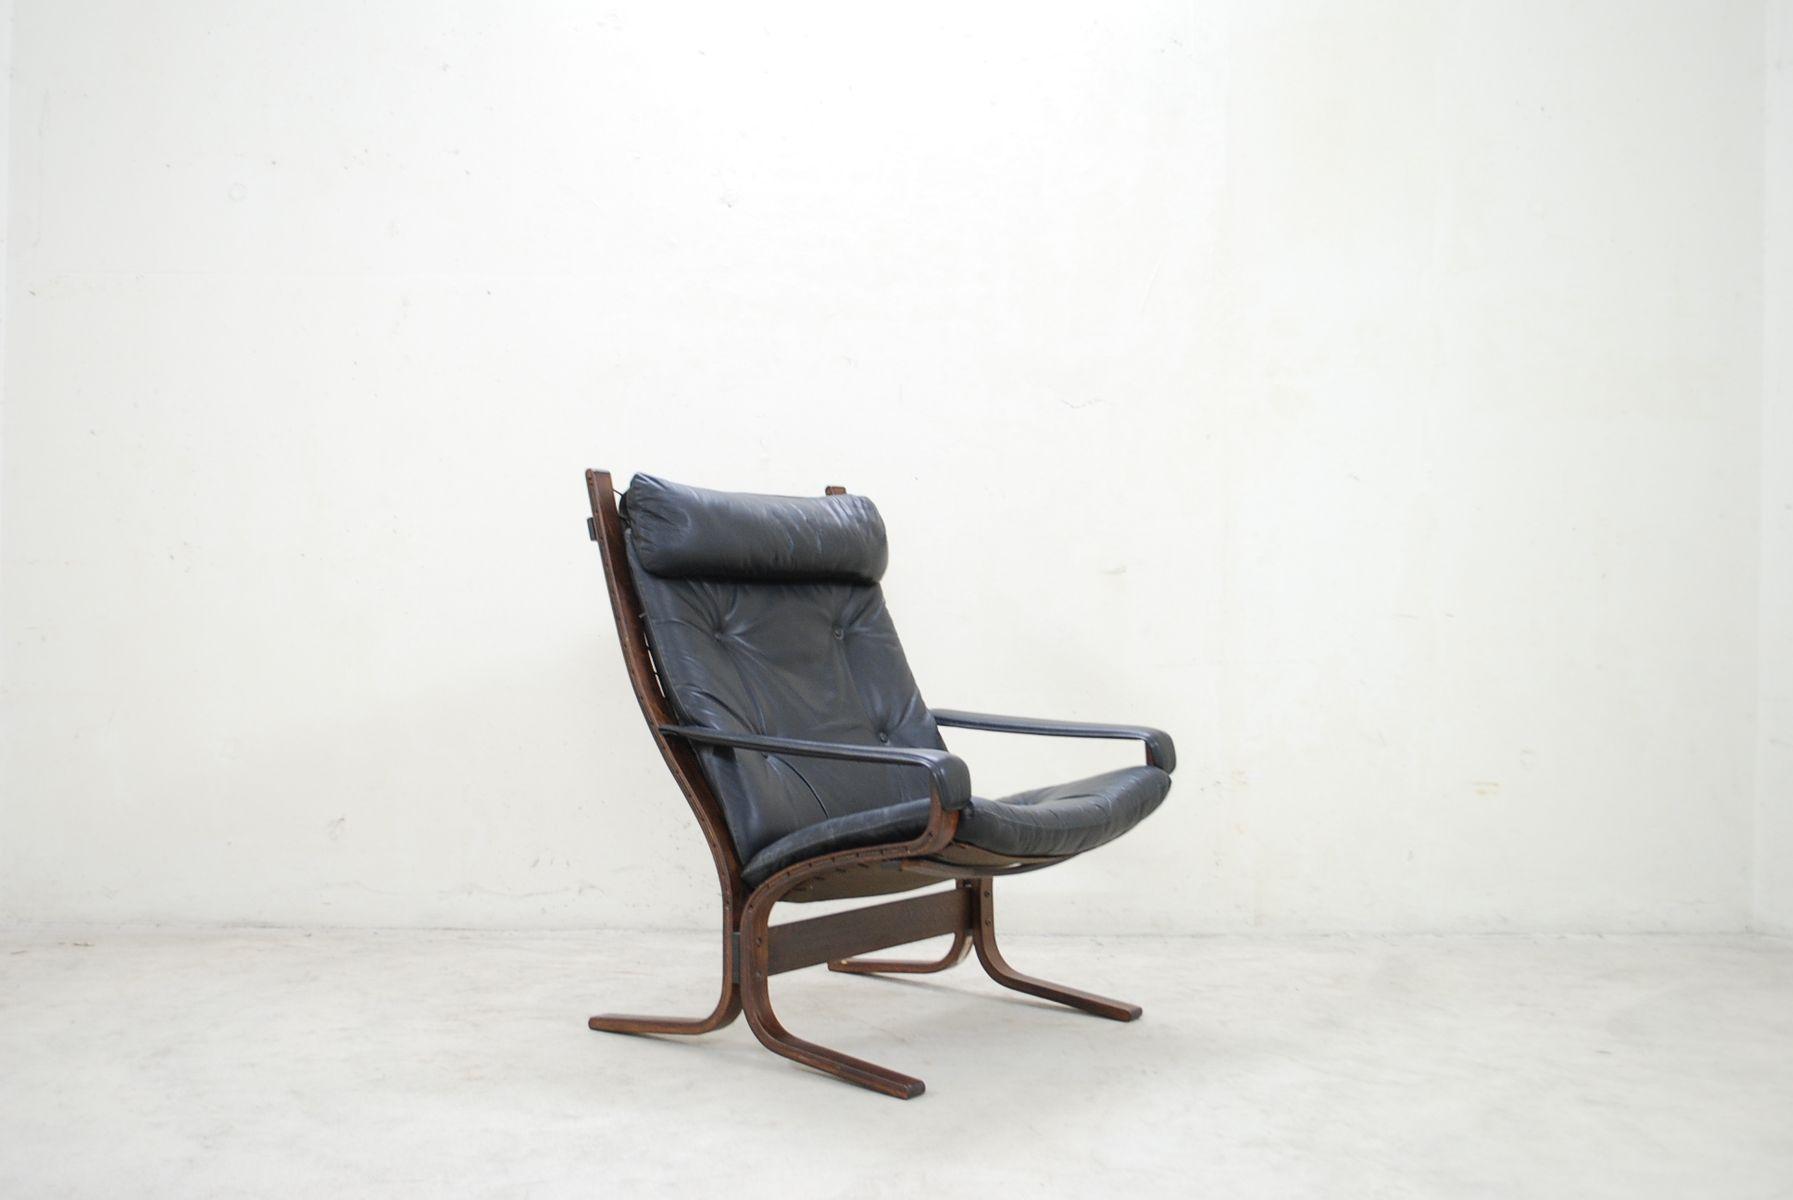 Vintage Siesta Model 303 Lounge Chair by Ingmar Relling for